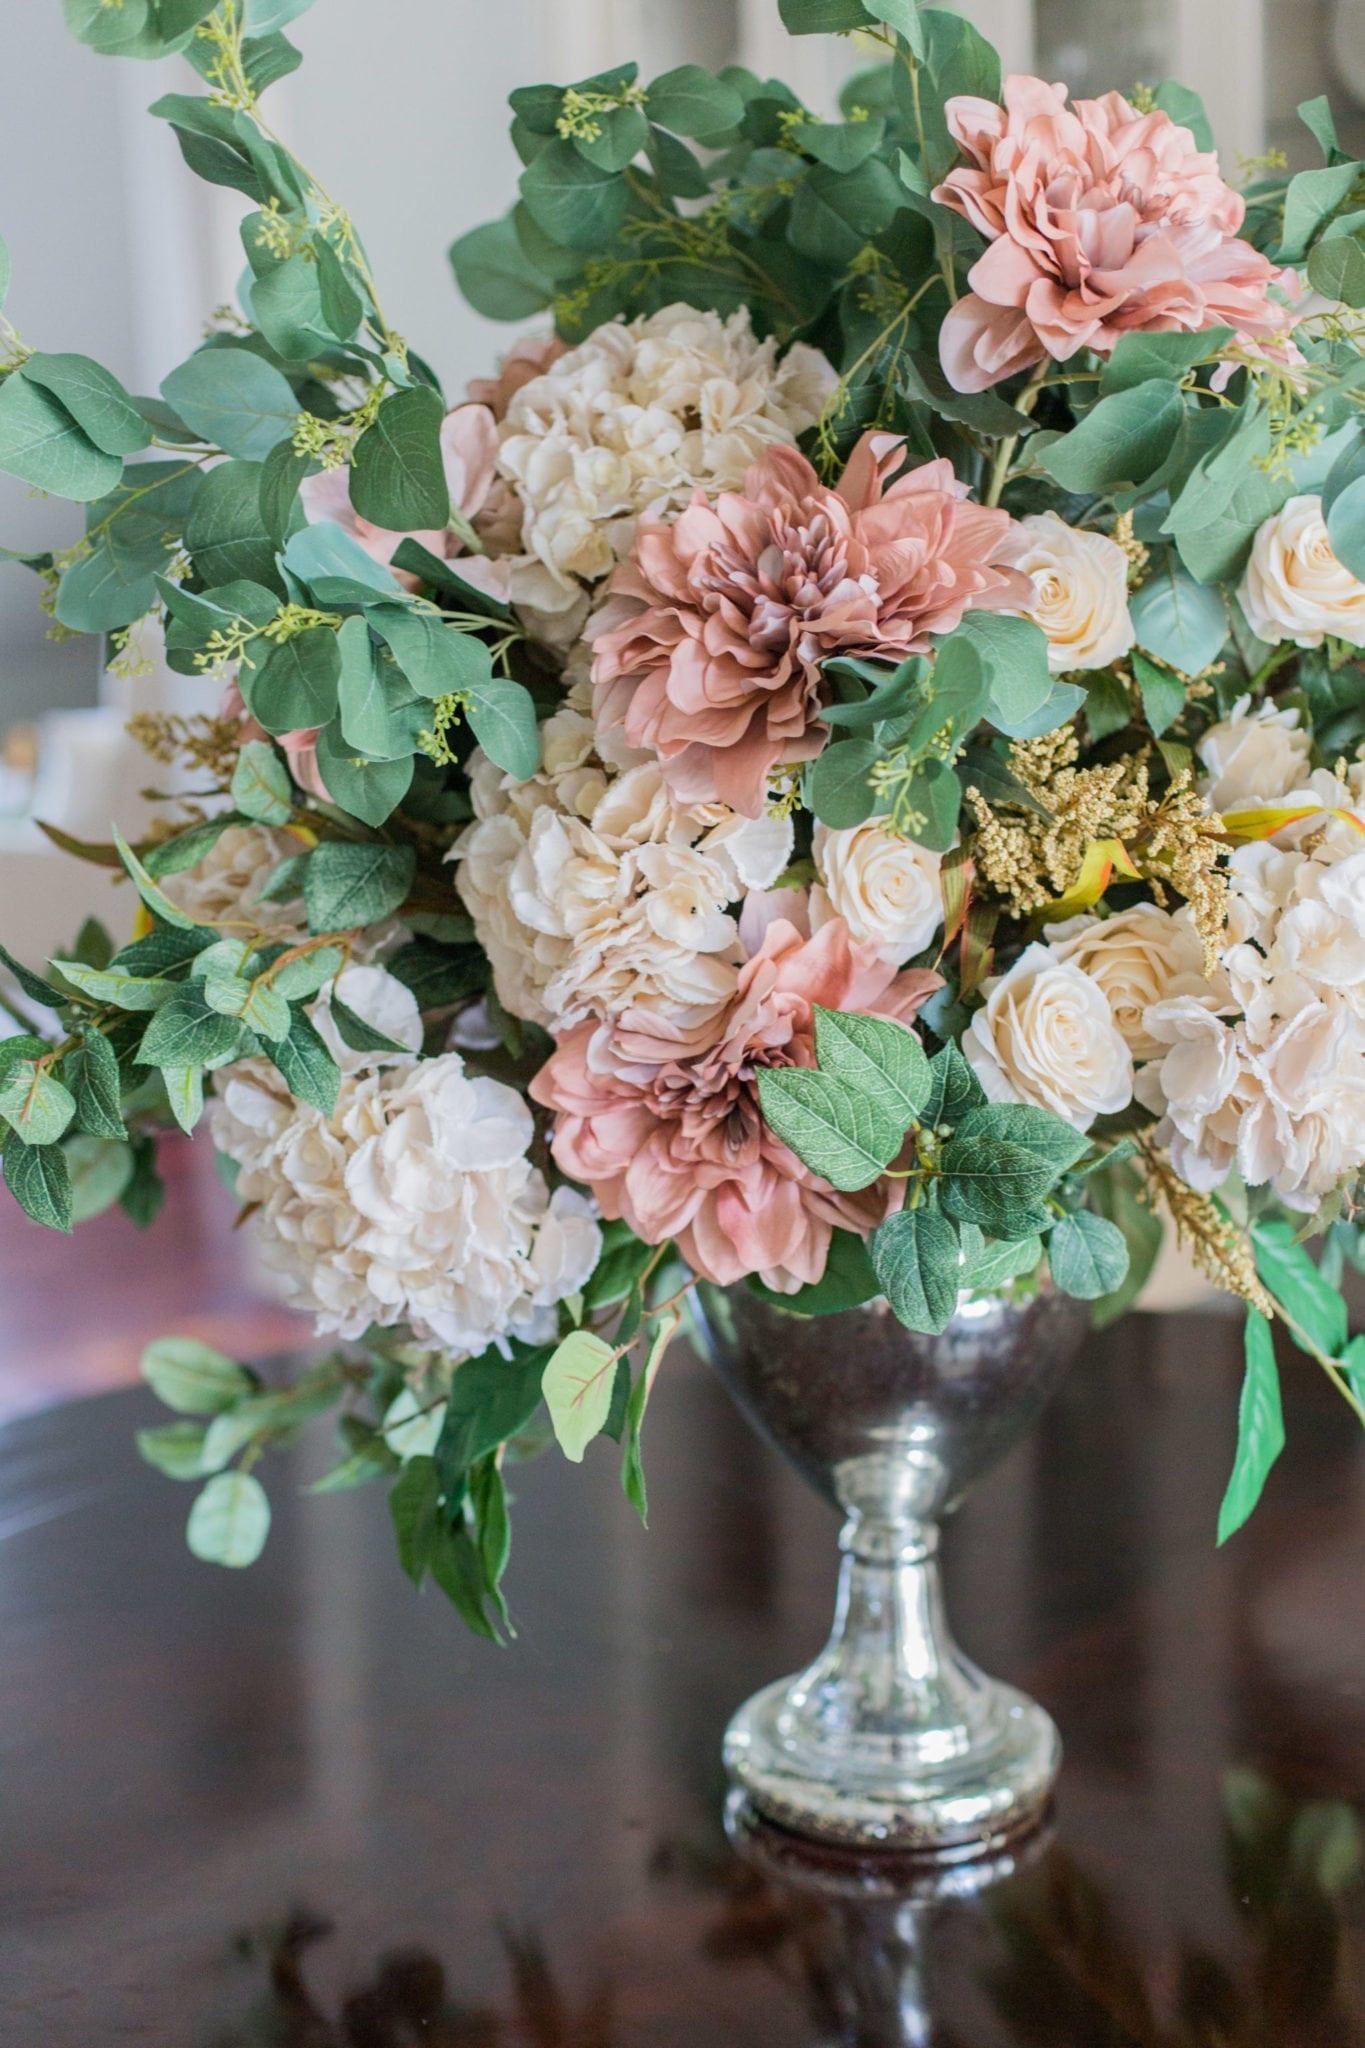 Large faux flower arrangement. How to make fake flower arrangements for fall Thanksgiving centerpiece.